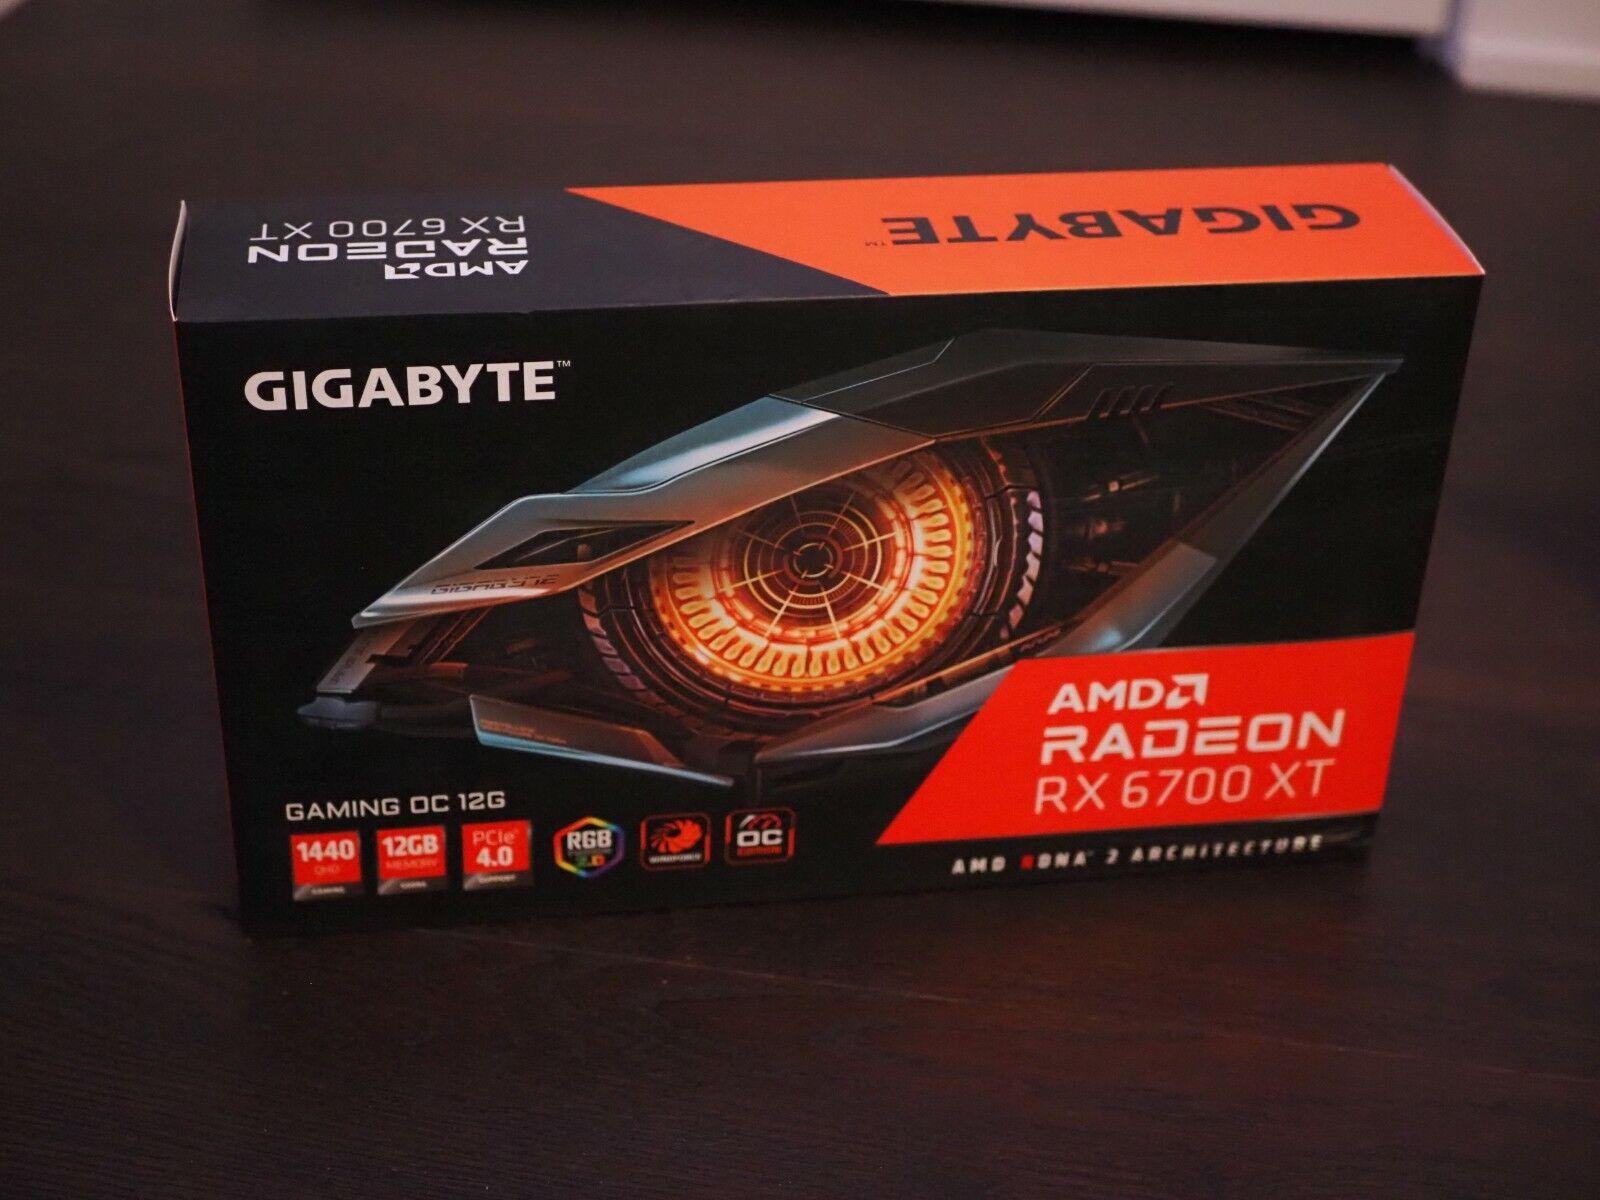 Gigabyte Radeon RX 6700 XT Gaming OC 12G Graphics Card - Brand New - $1,024.99